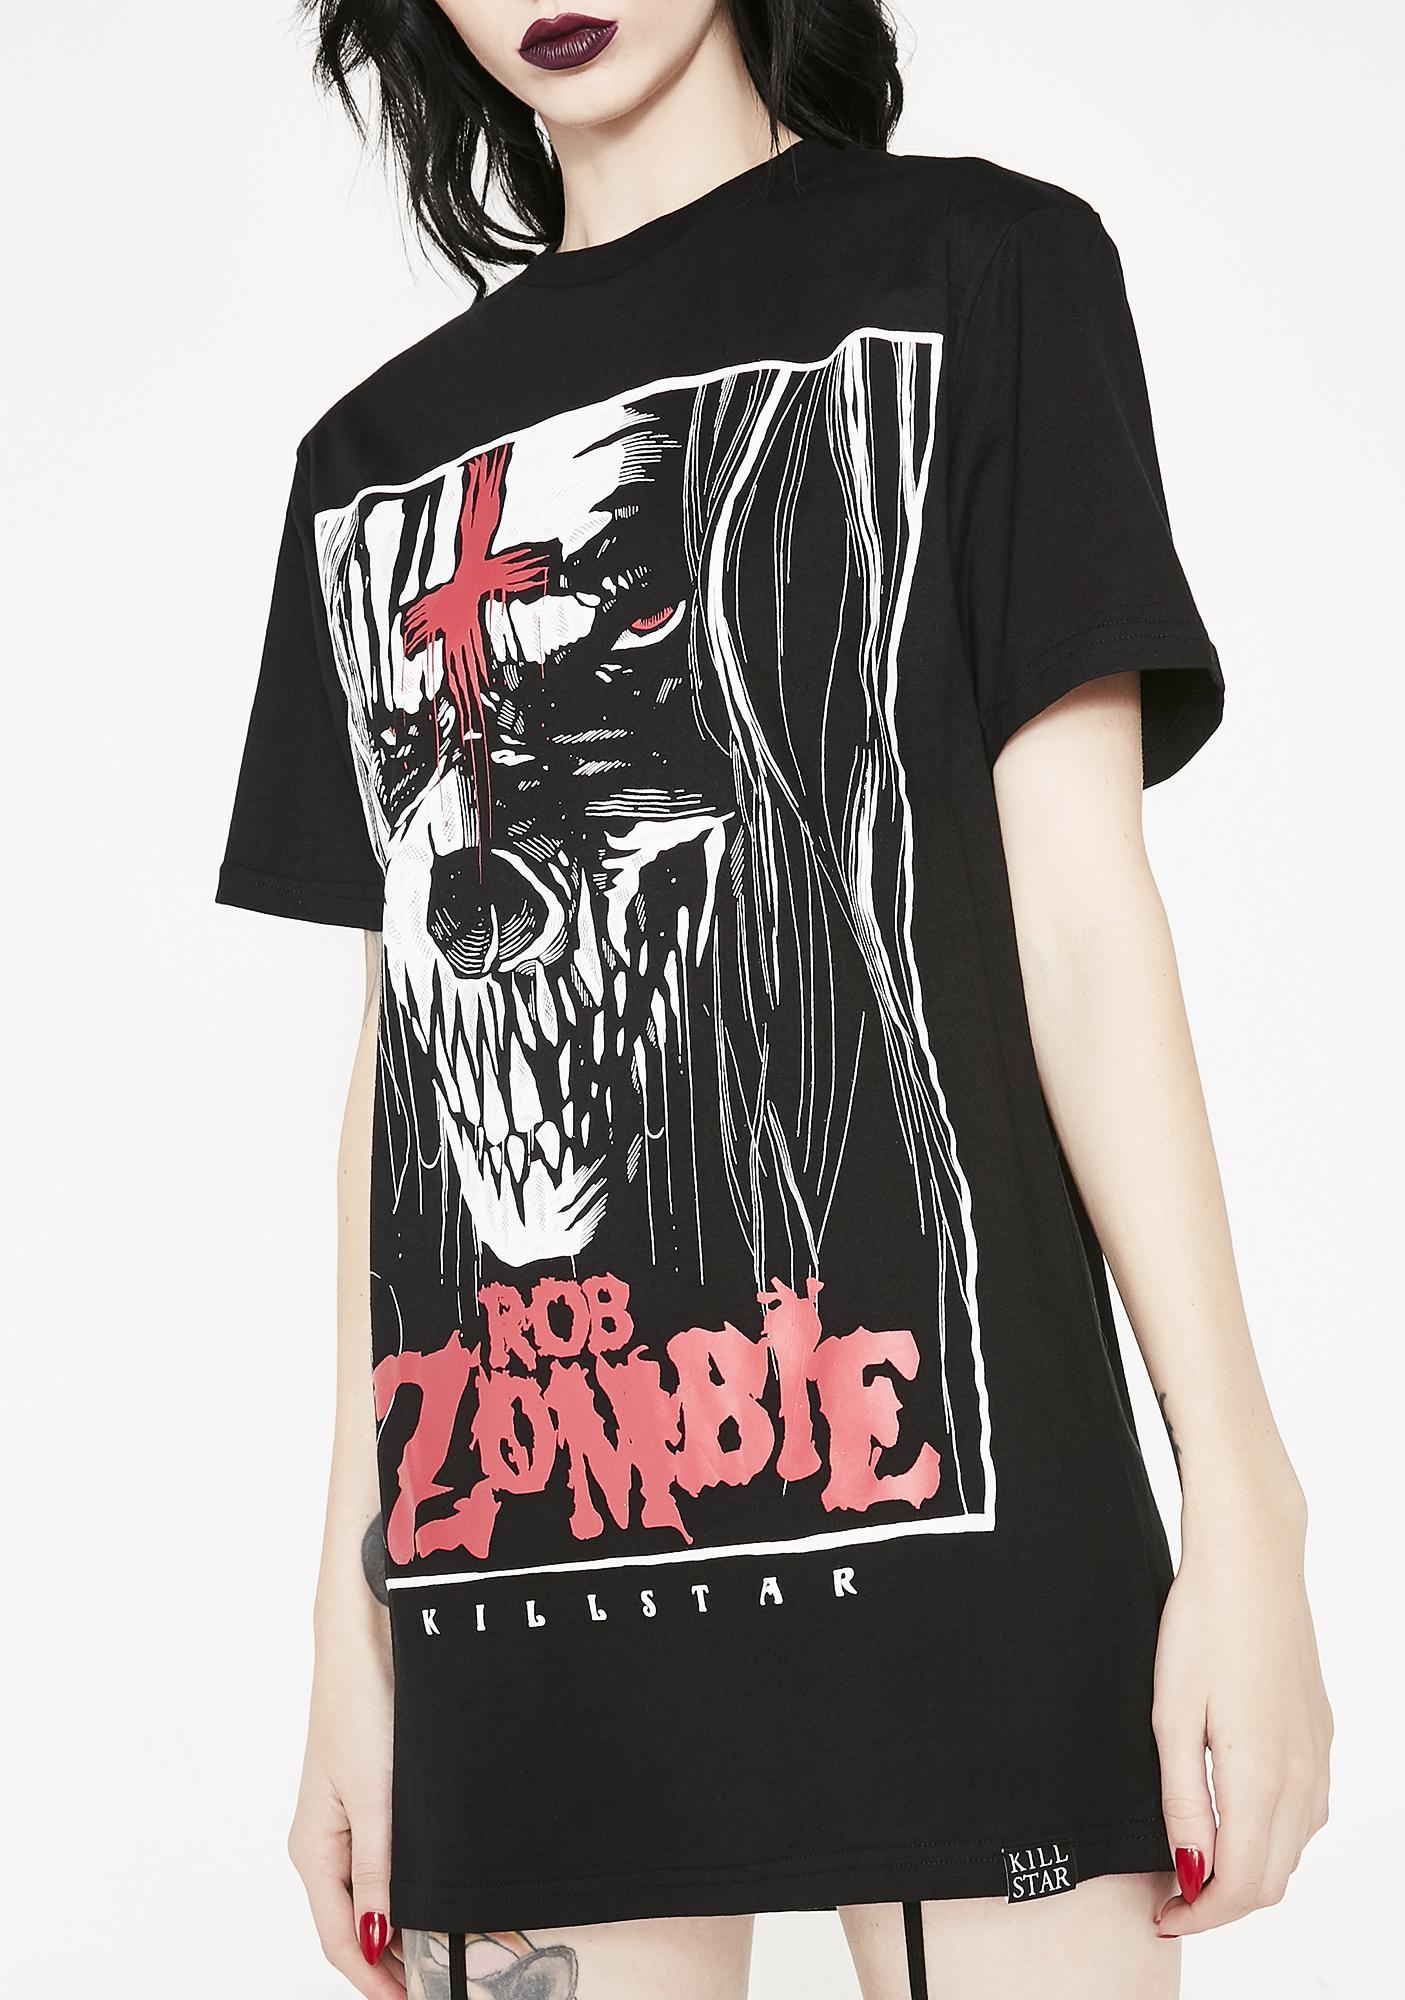 Killstar The End T-Shirt